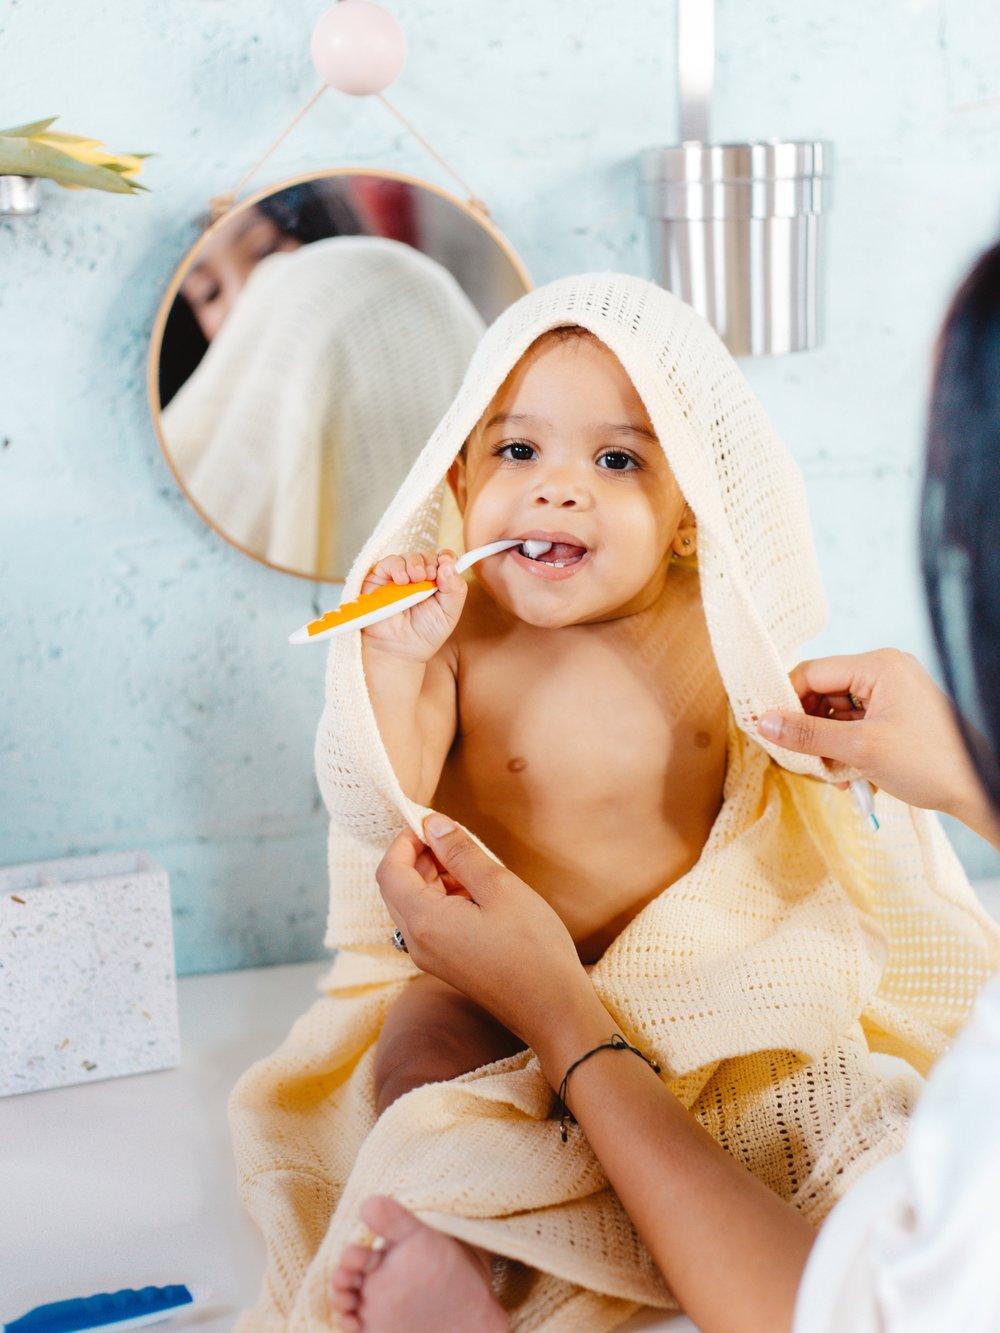 Super Powers 3X Toothbrush -